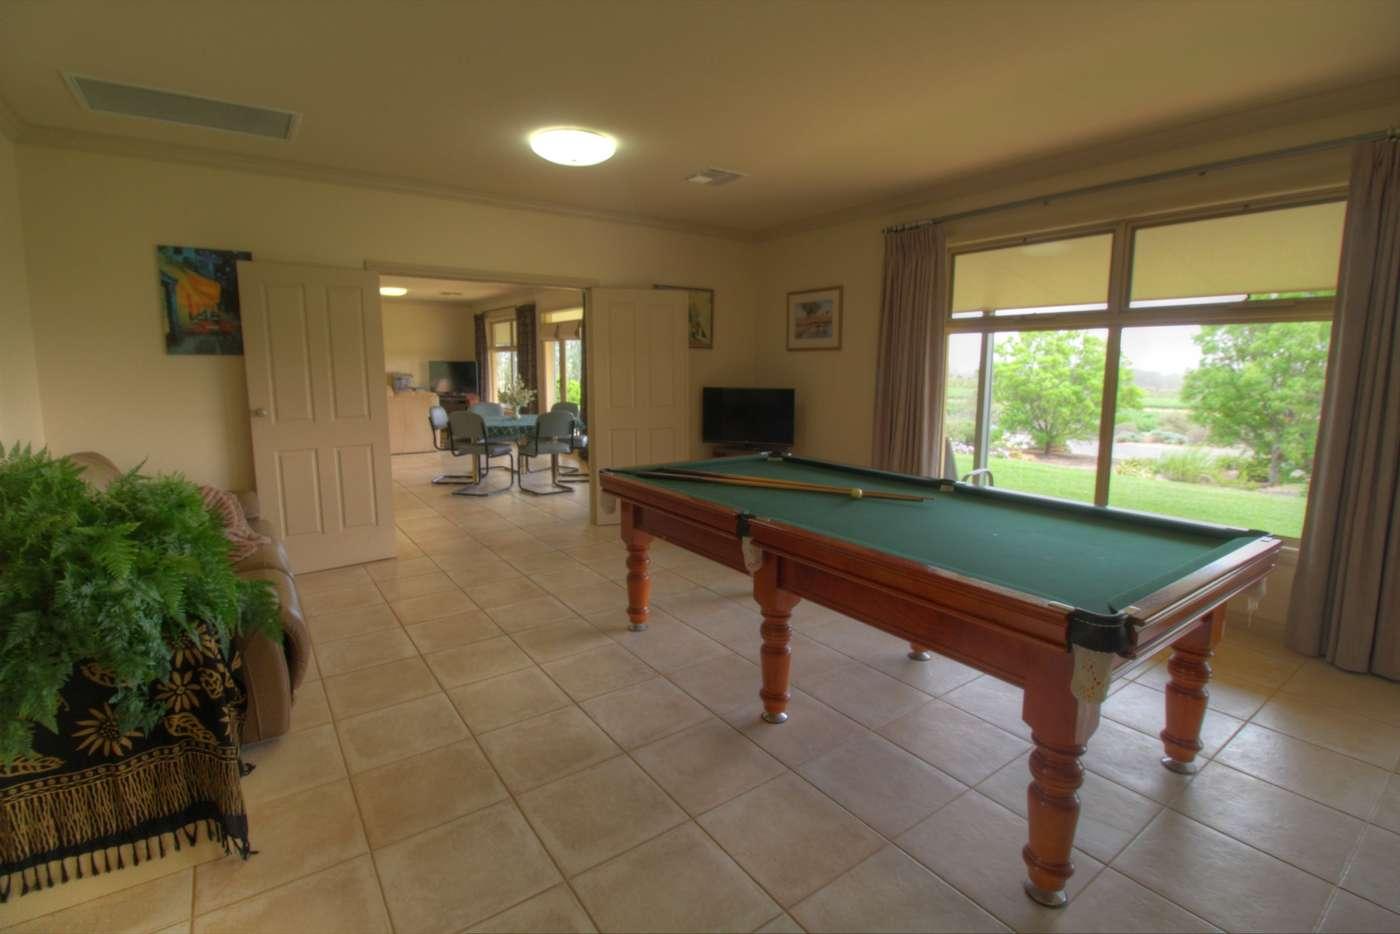 Sixth view of Homely house listing, 67 Farley Road, Kingston On Murray SA 5331